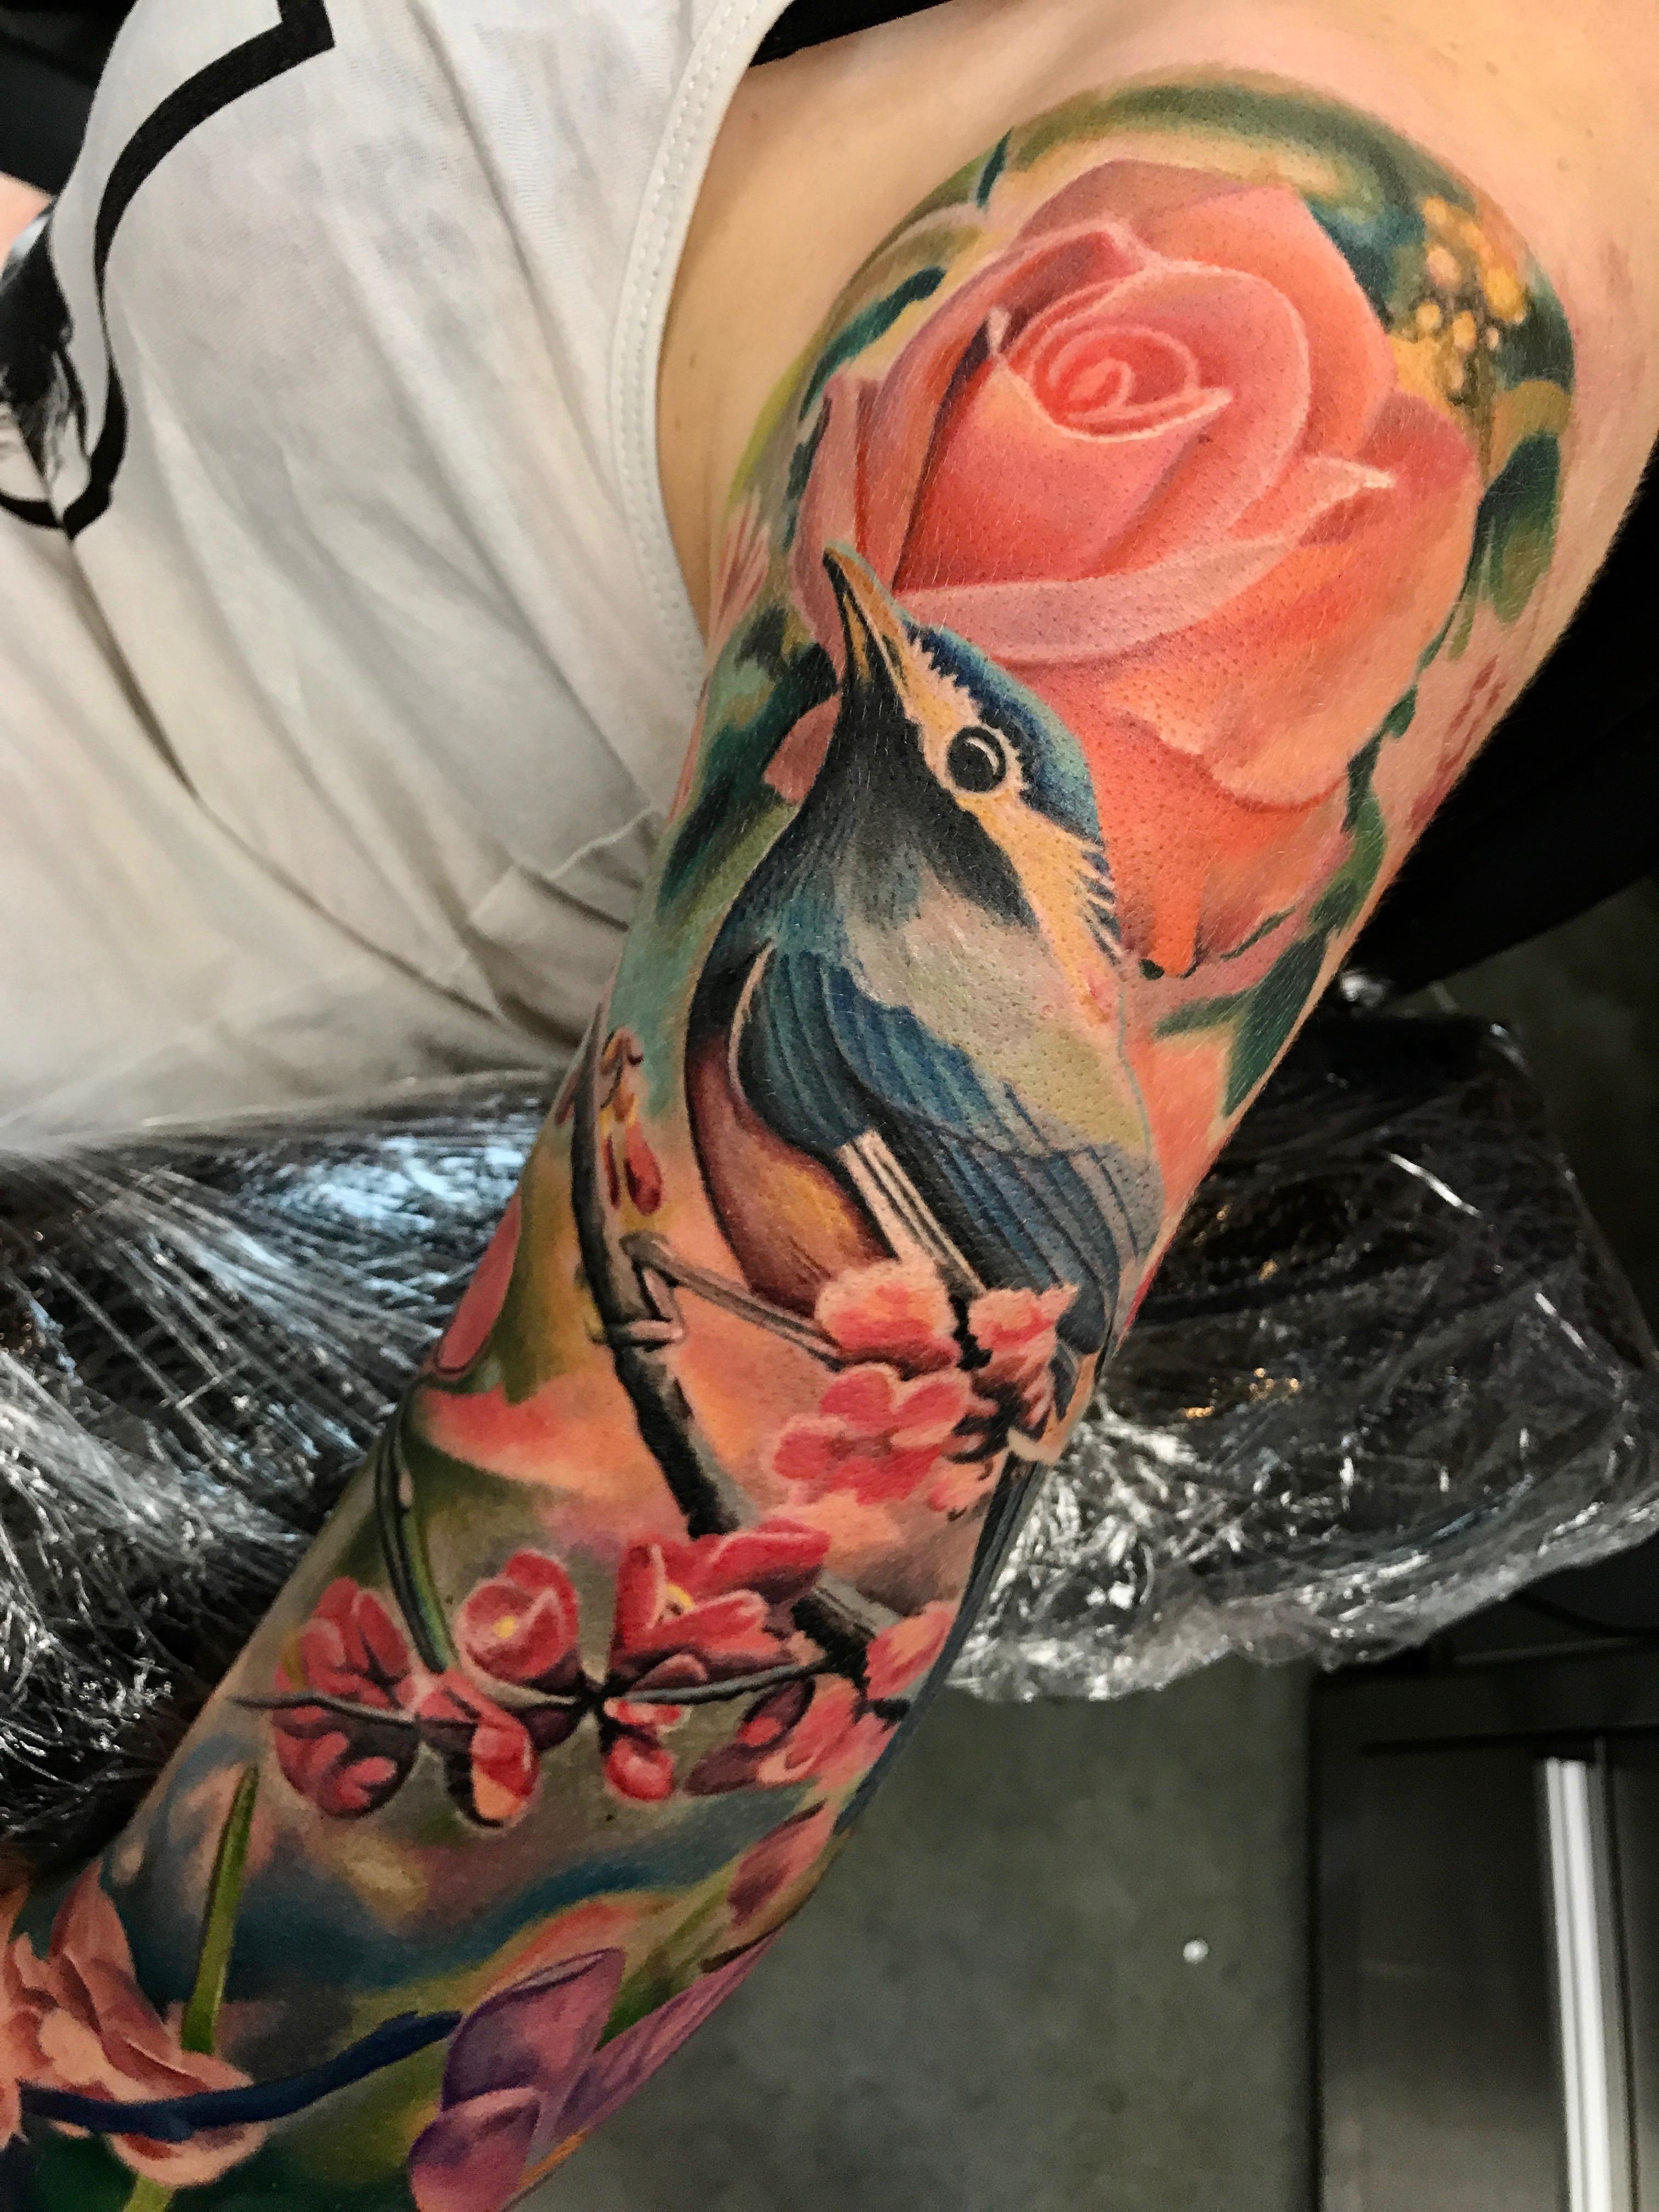 electrographic tattoo,germany, bayern, rosenheim, münchen , salzburg , innsbruck, vogel, rose, tattoo, tattoo art, color, realistic